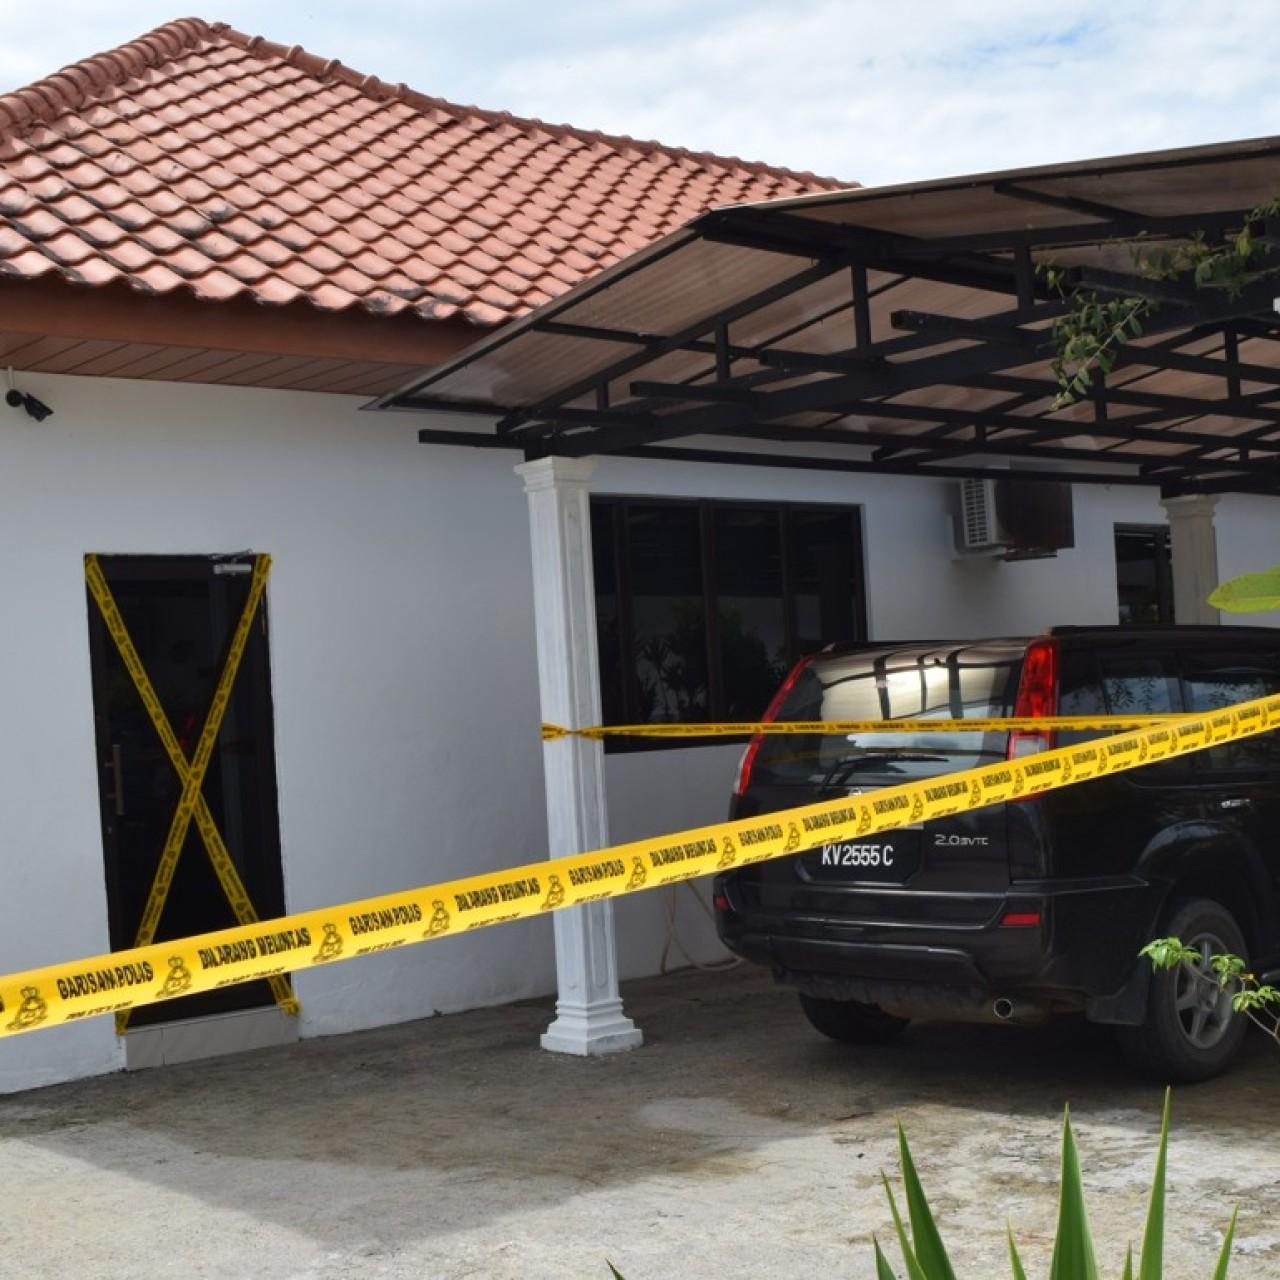 Killing of British expat on Malaysian island of Langkawi exposes